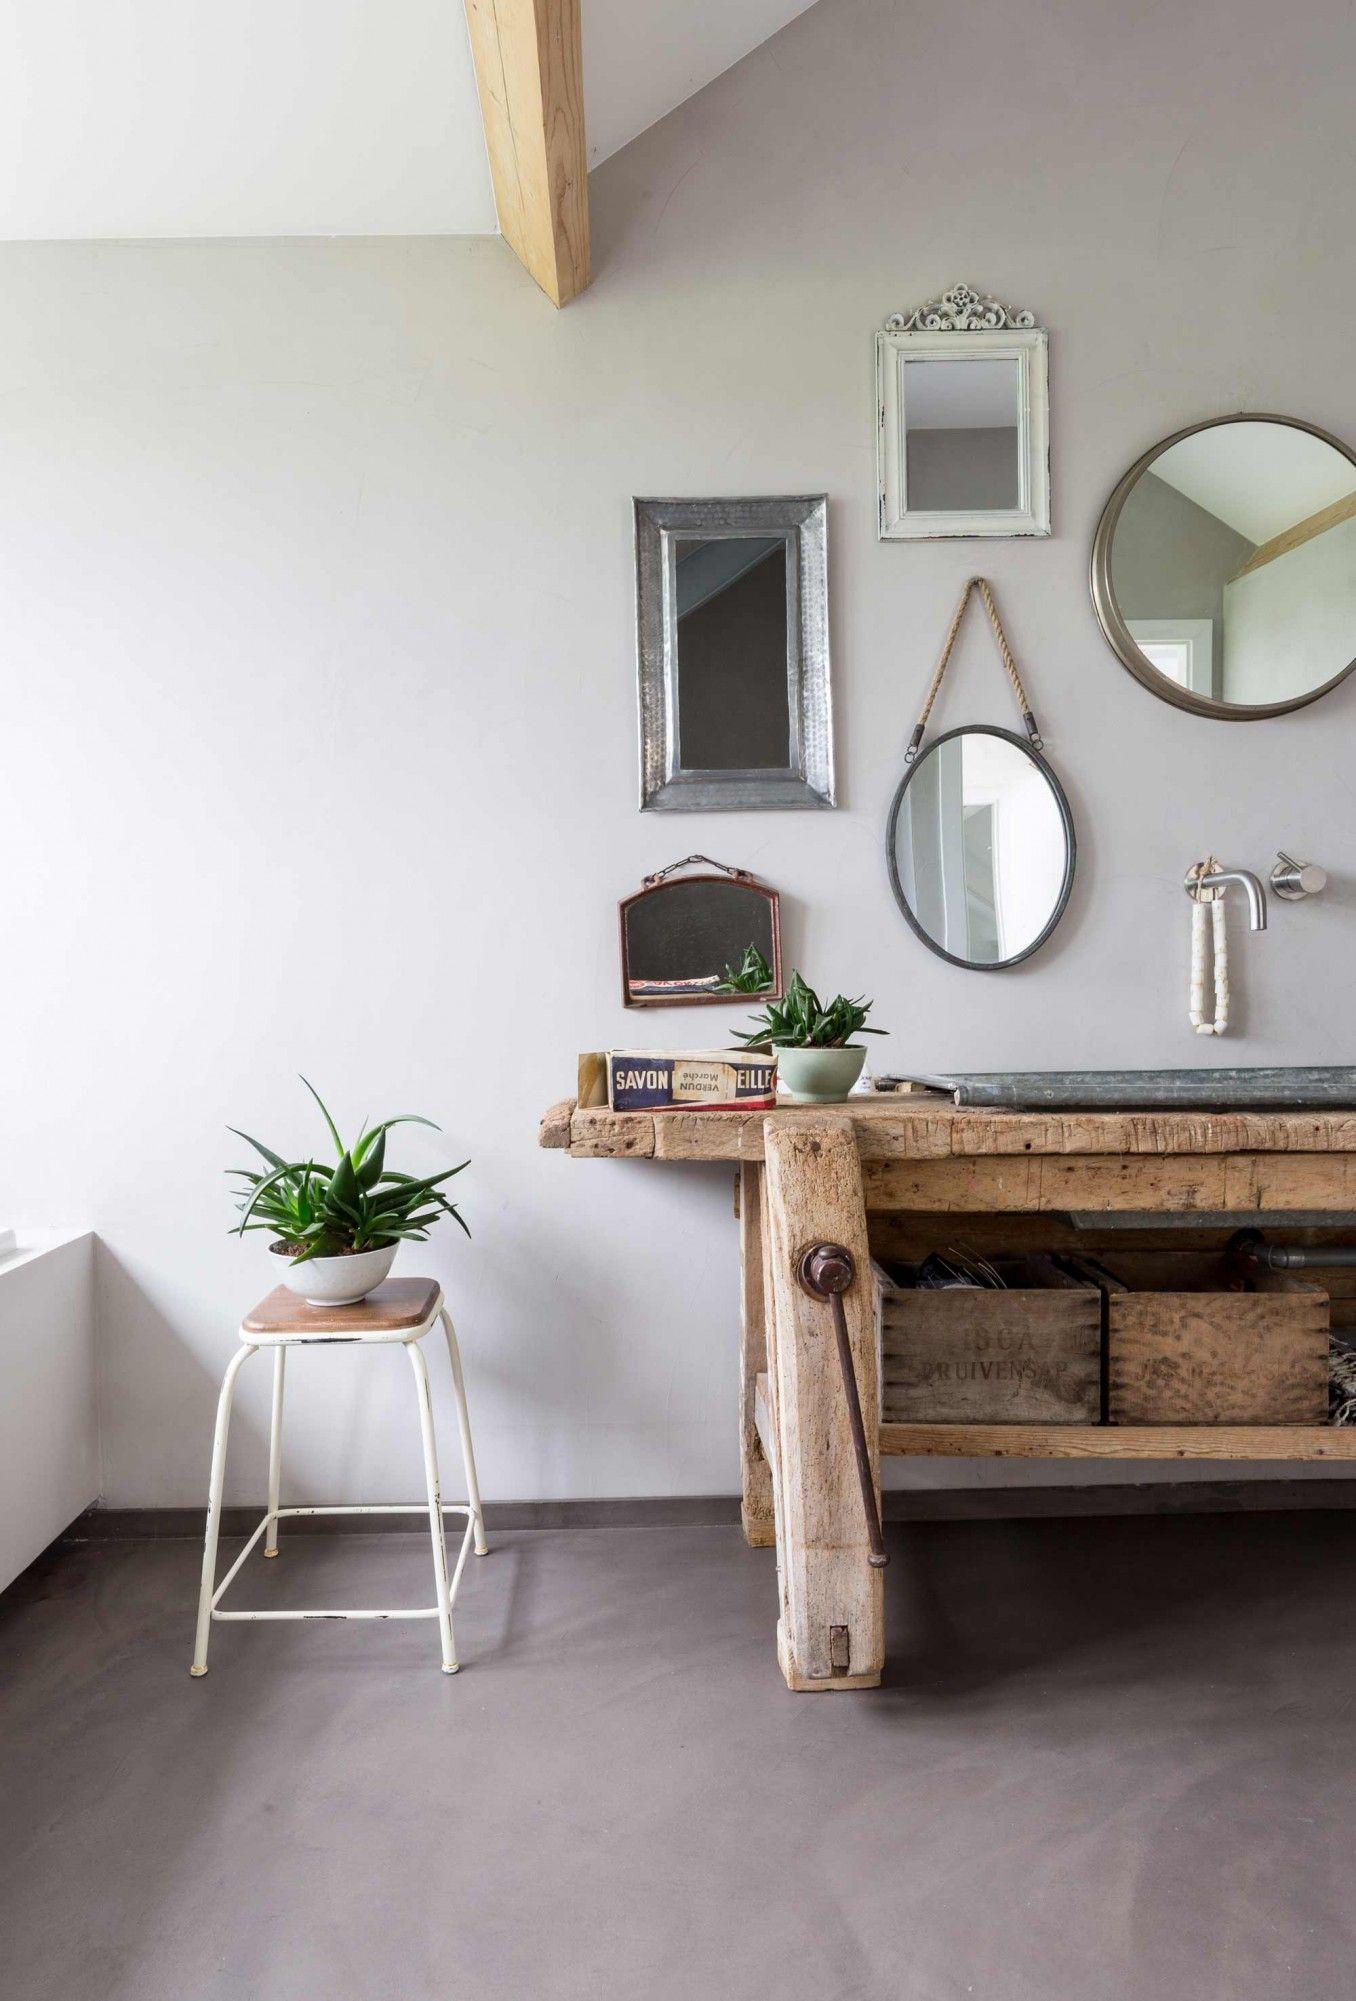 Salle de bain rustique chic, meuble ancien en bois, collection de ...